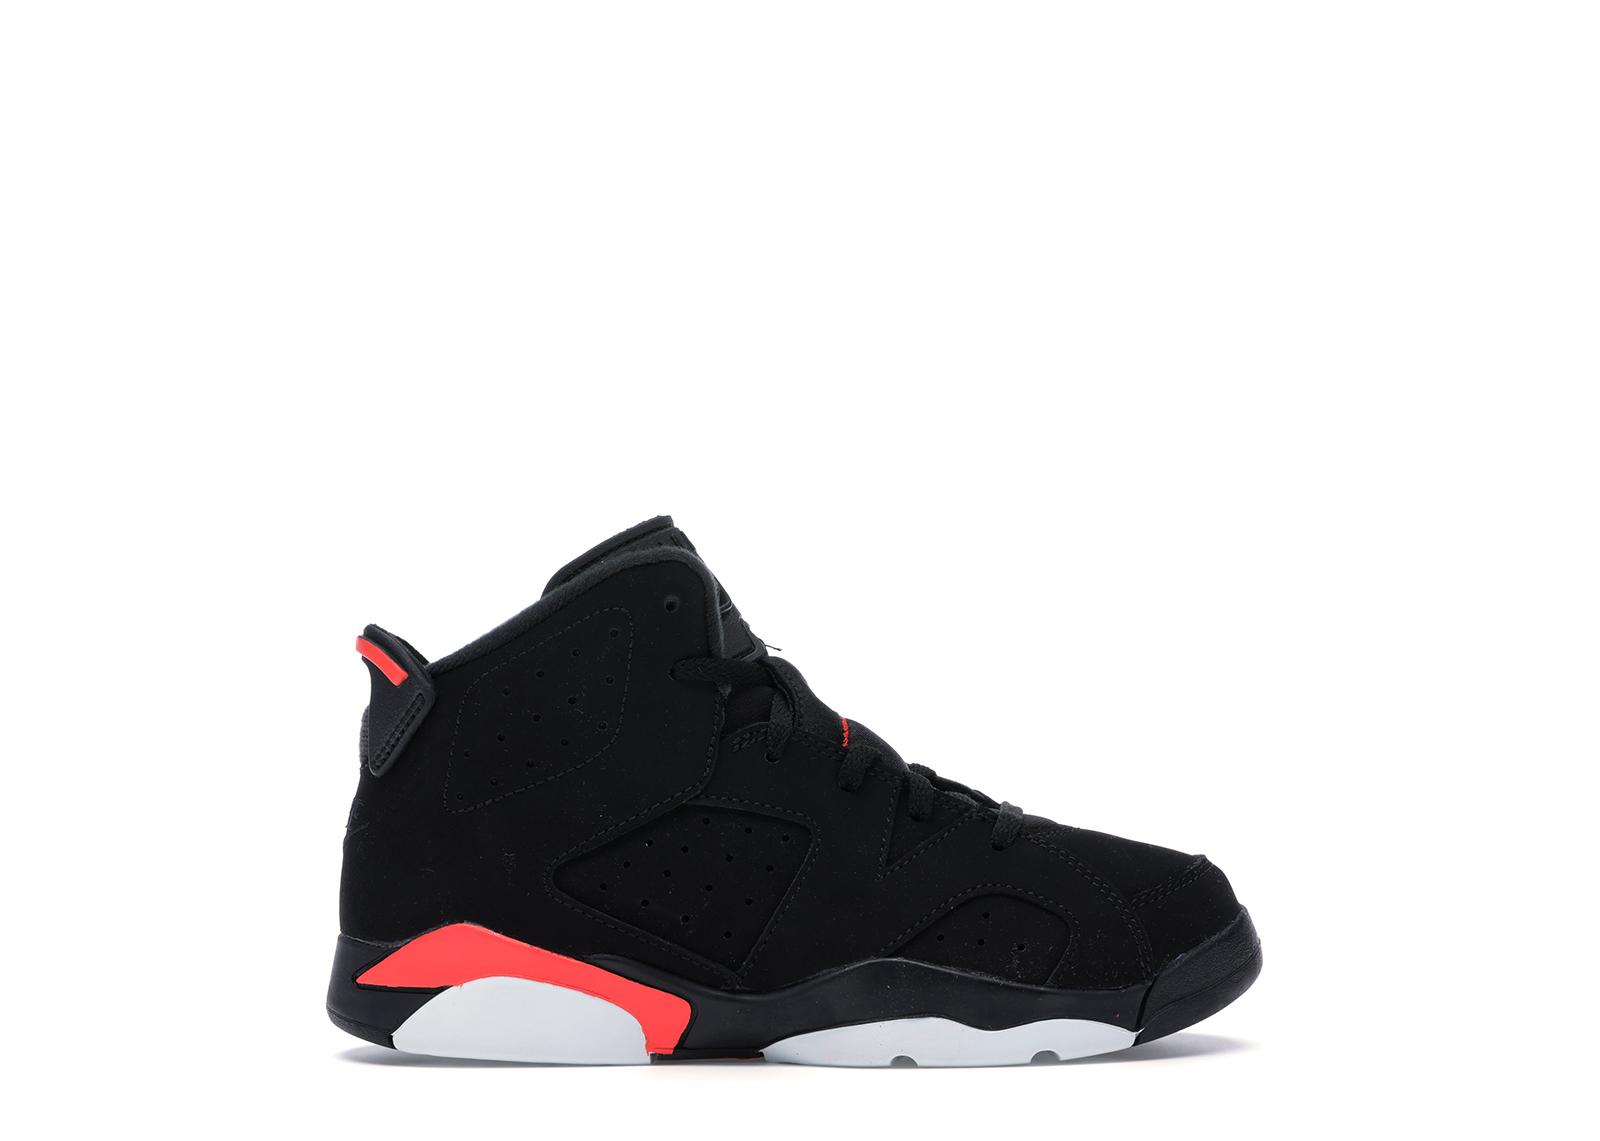 Jordan 6 Retro Black Infrared 2019 (PS)